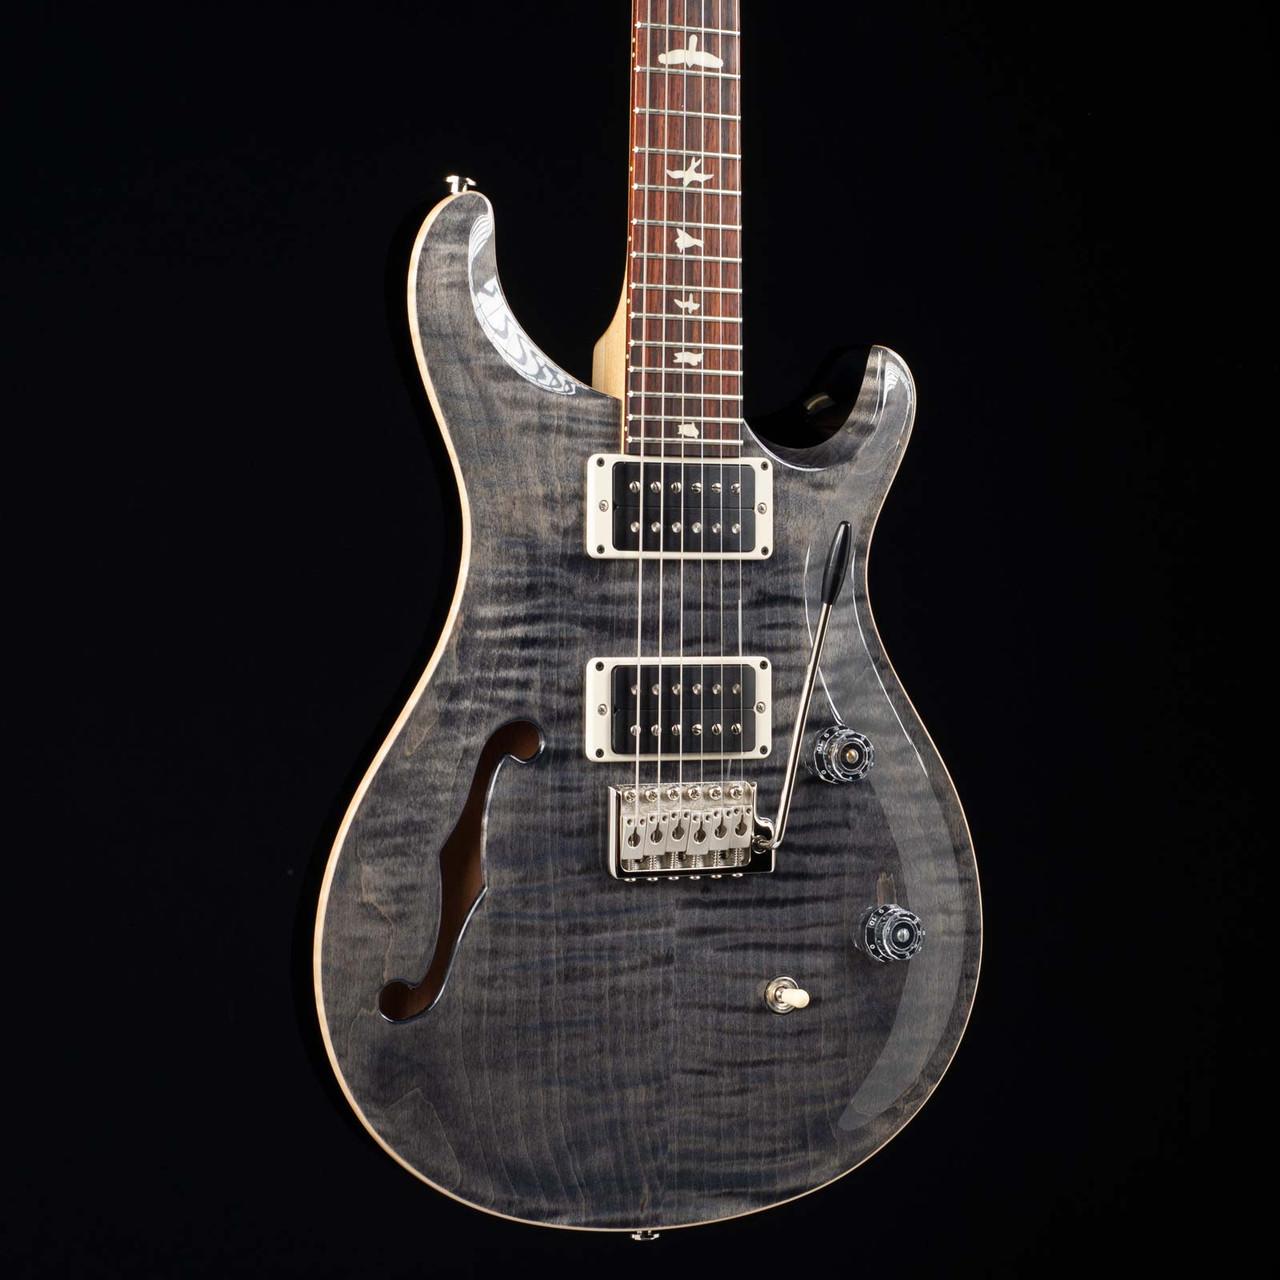 prs ce 24 semi hollow grey black 1033 at moore guitars. Black Bedroom Furniture Sets. Home Design Ideas